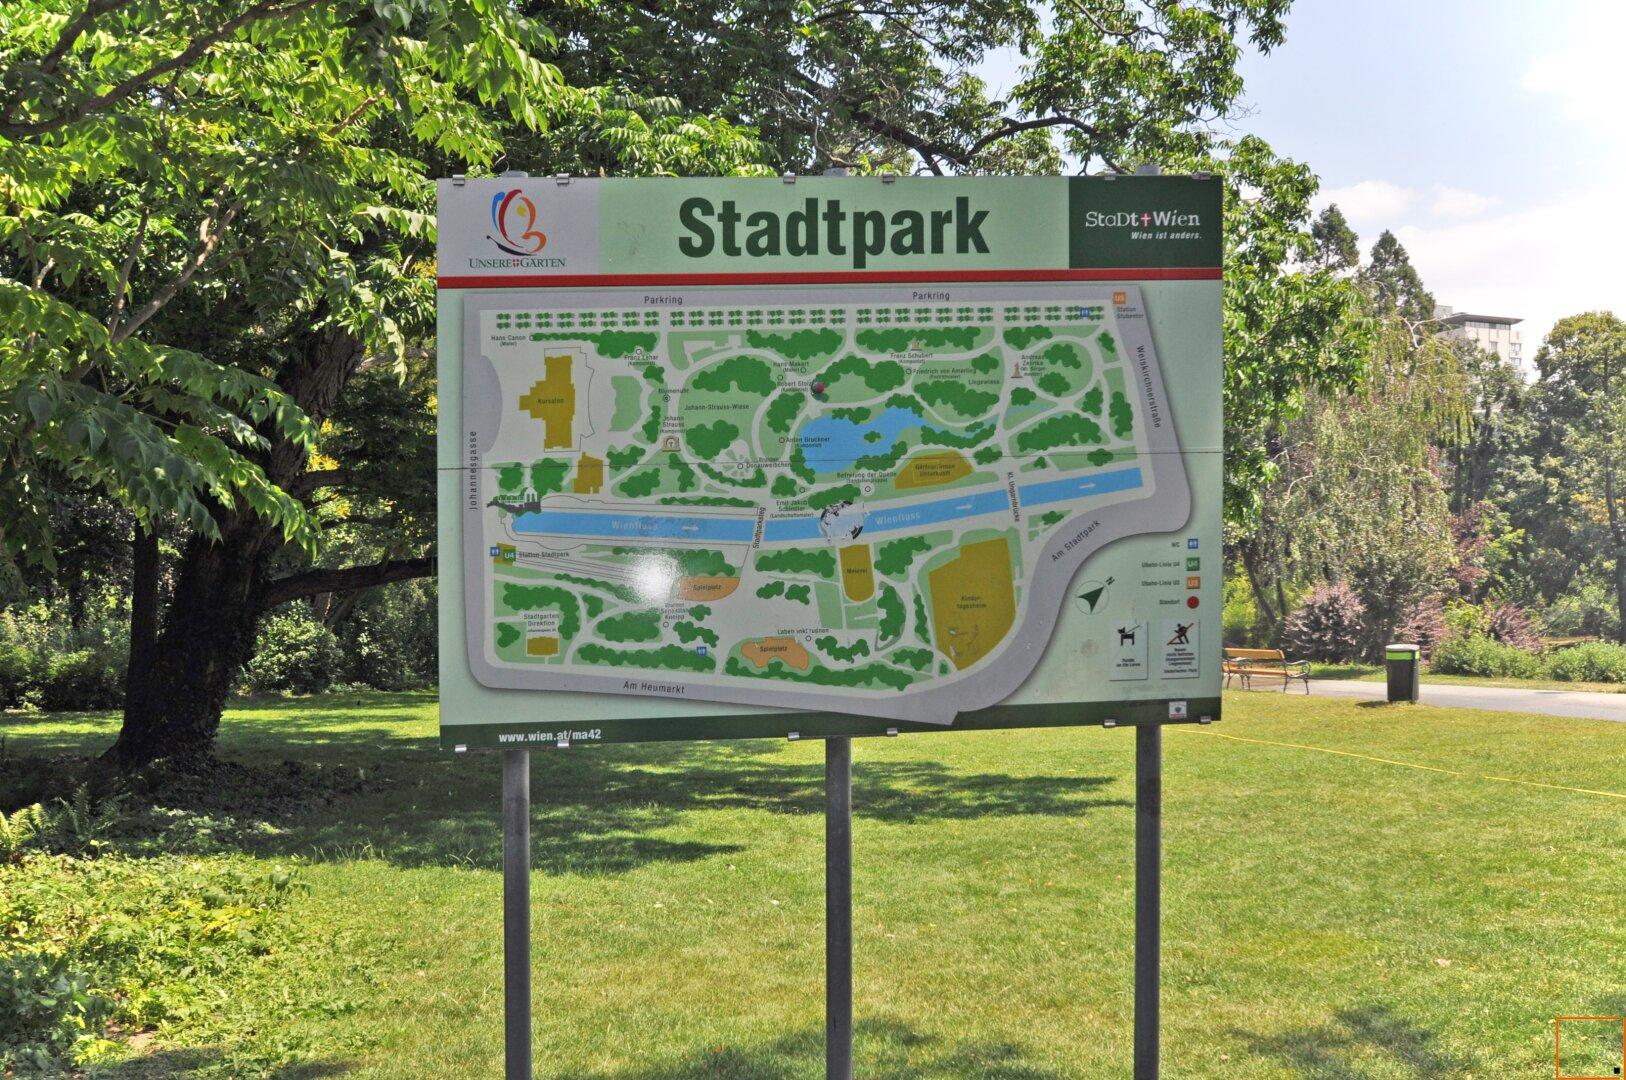 nahegelegener Stadtpark